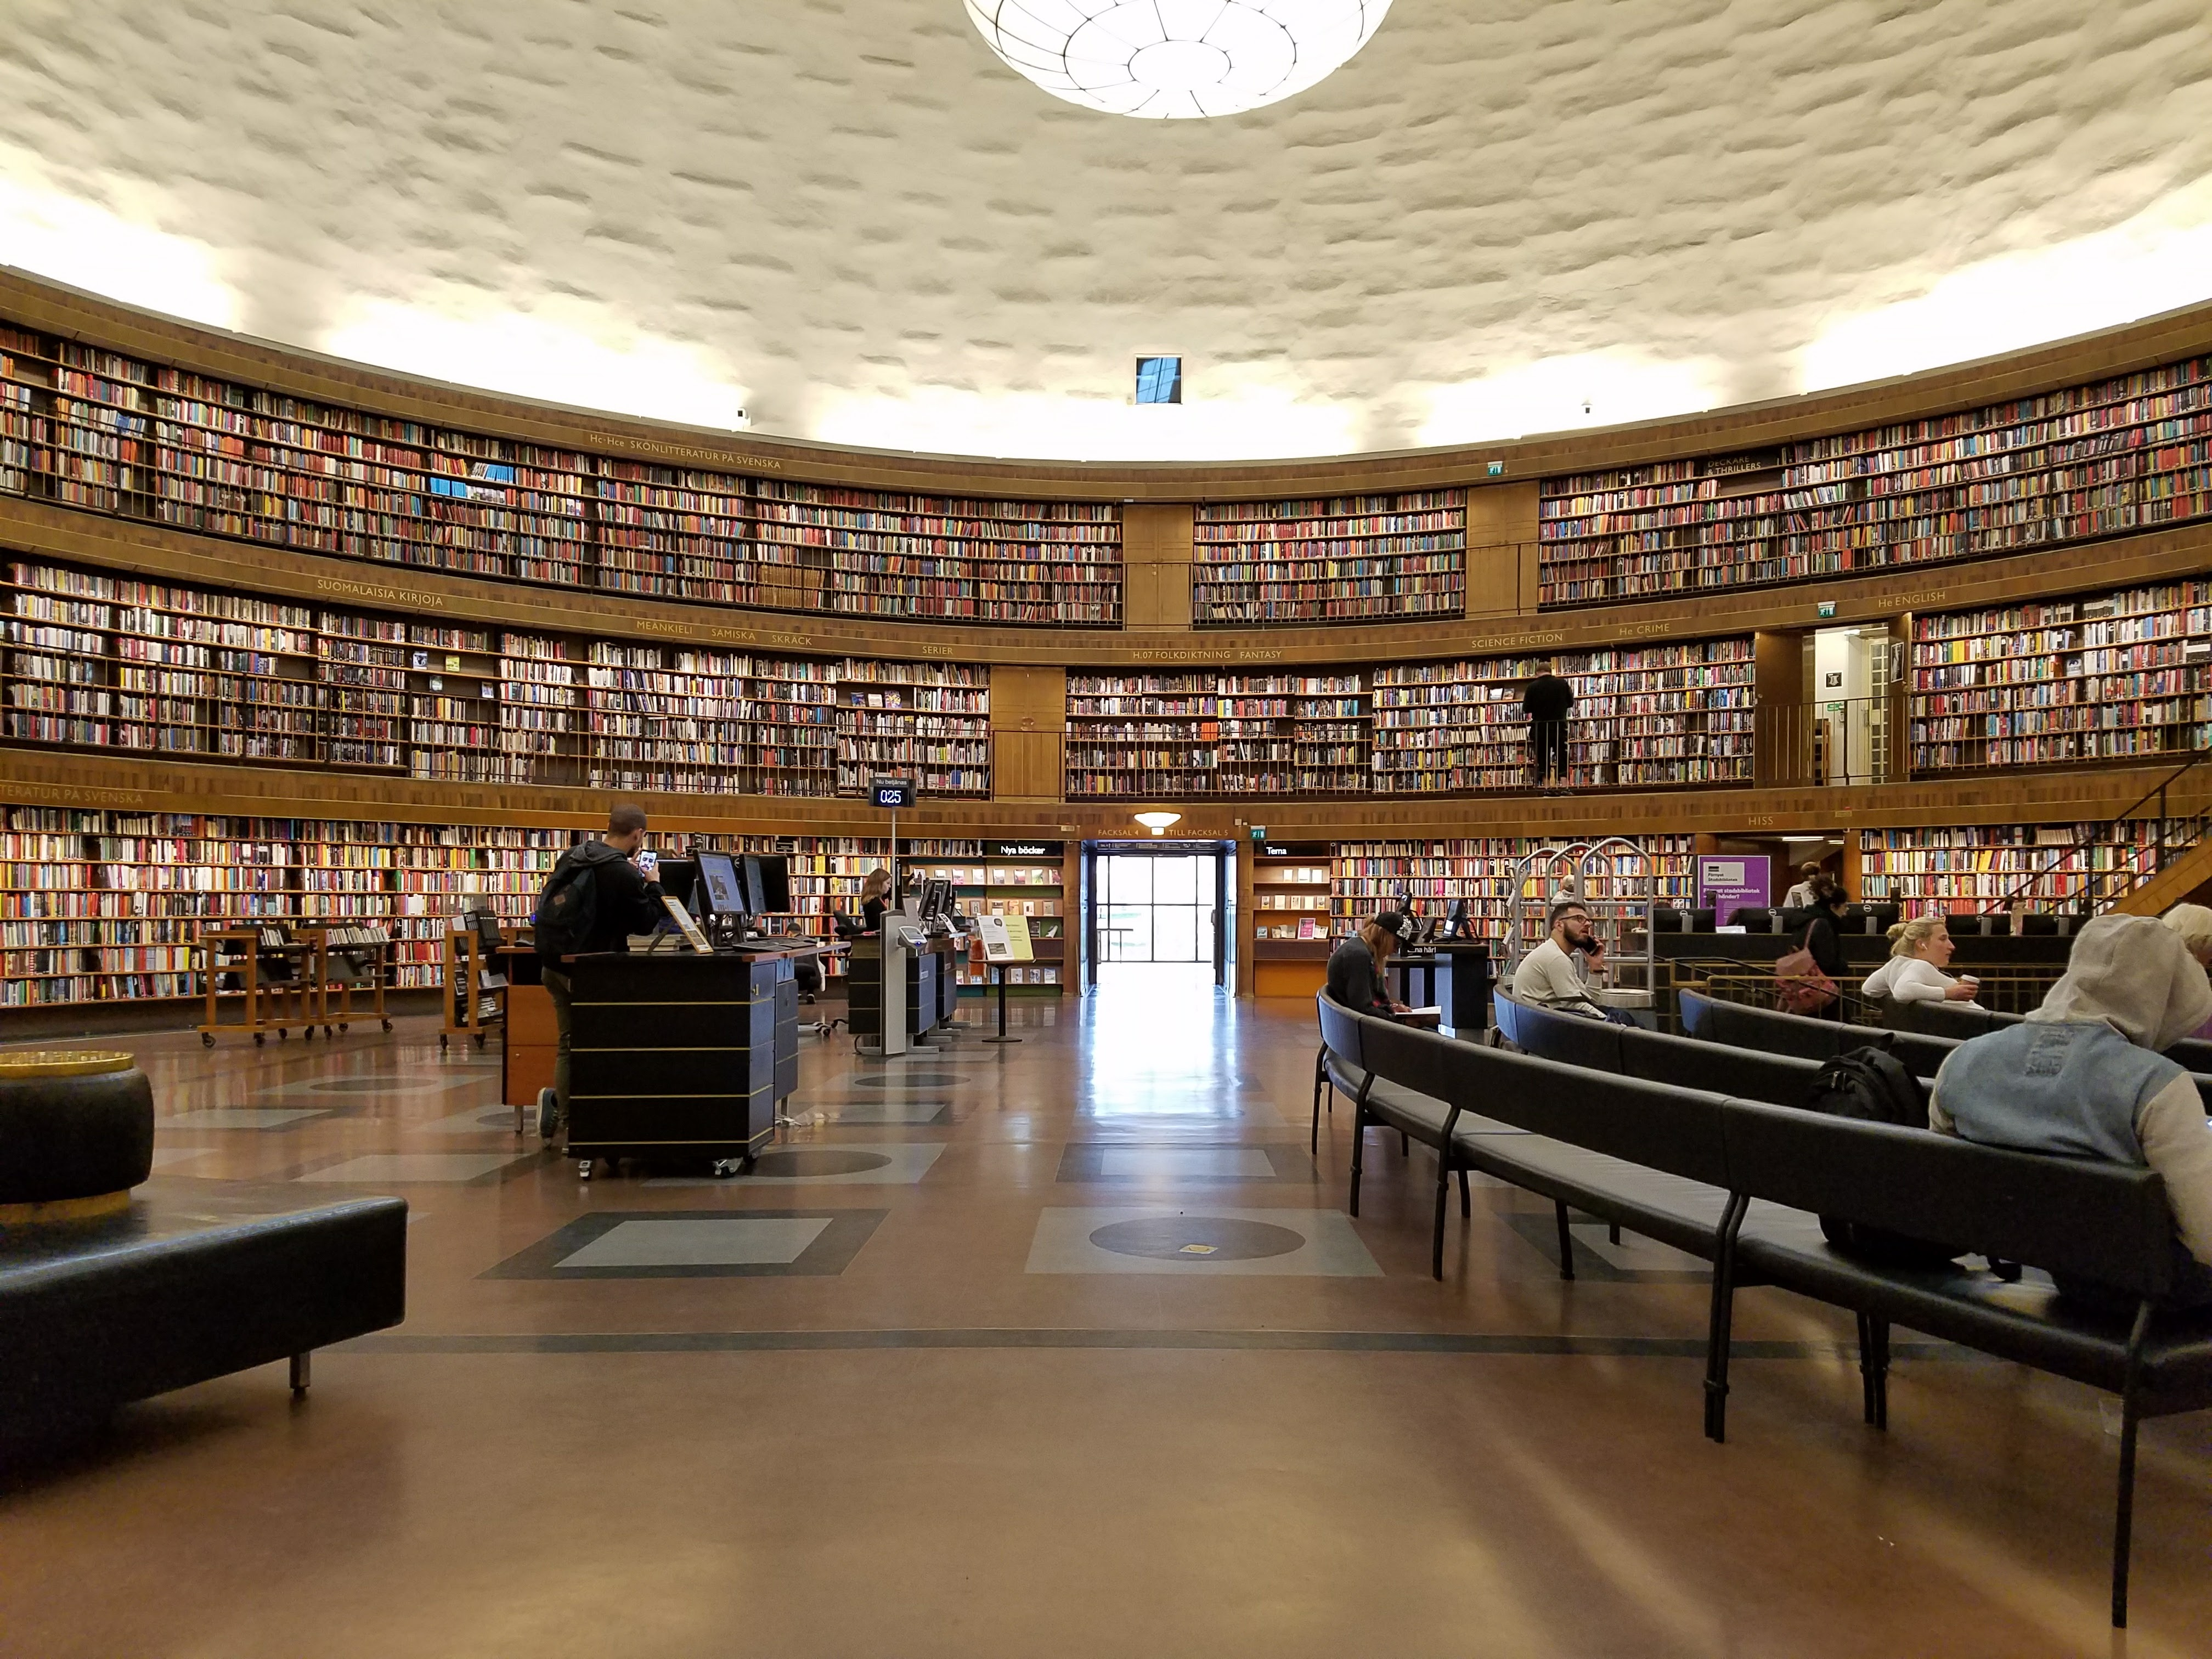 Stockholms stadsbibliotek main floor